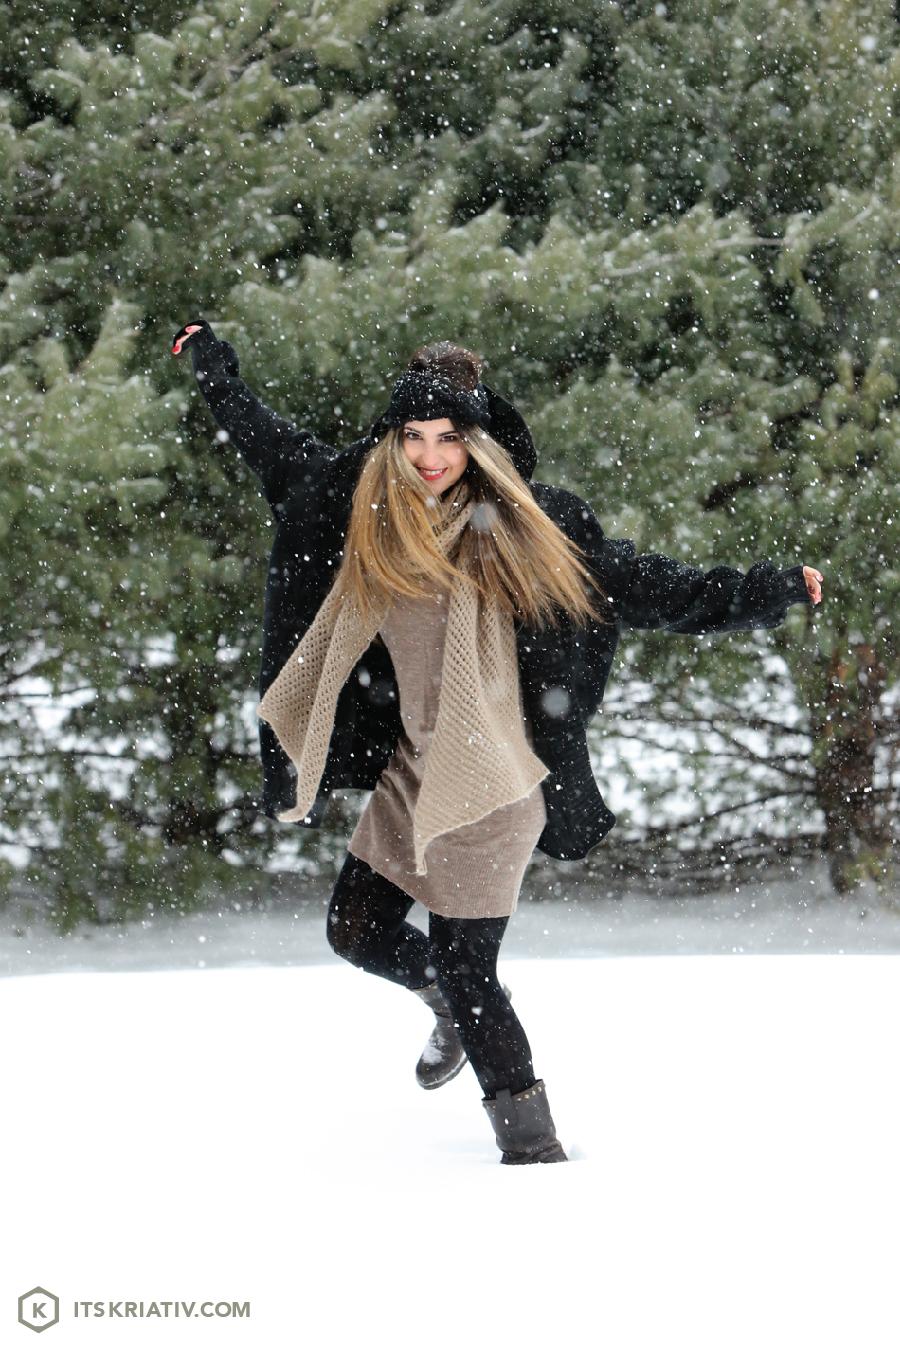 Its-Kriativ-Fashion-Let-It-Snow-Winter-05.jpg